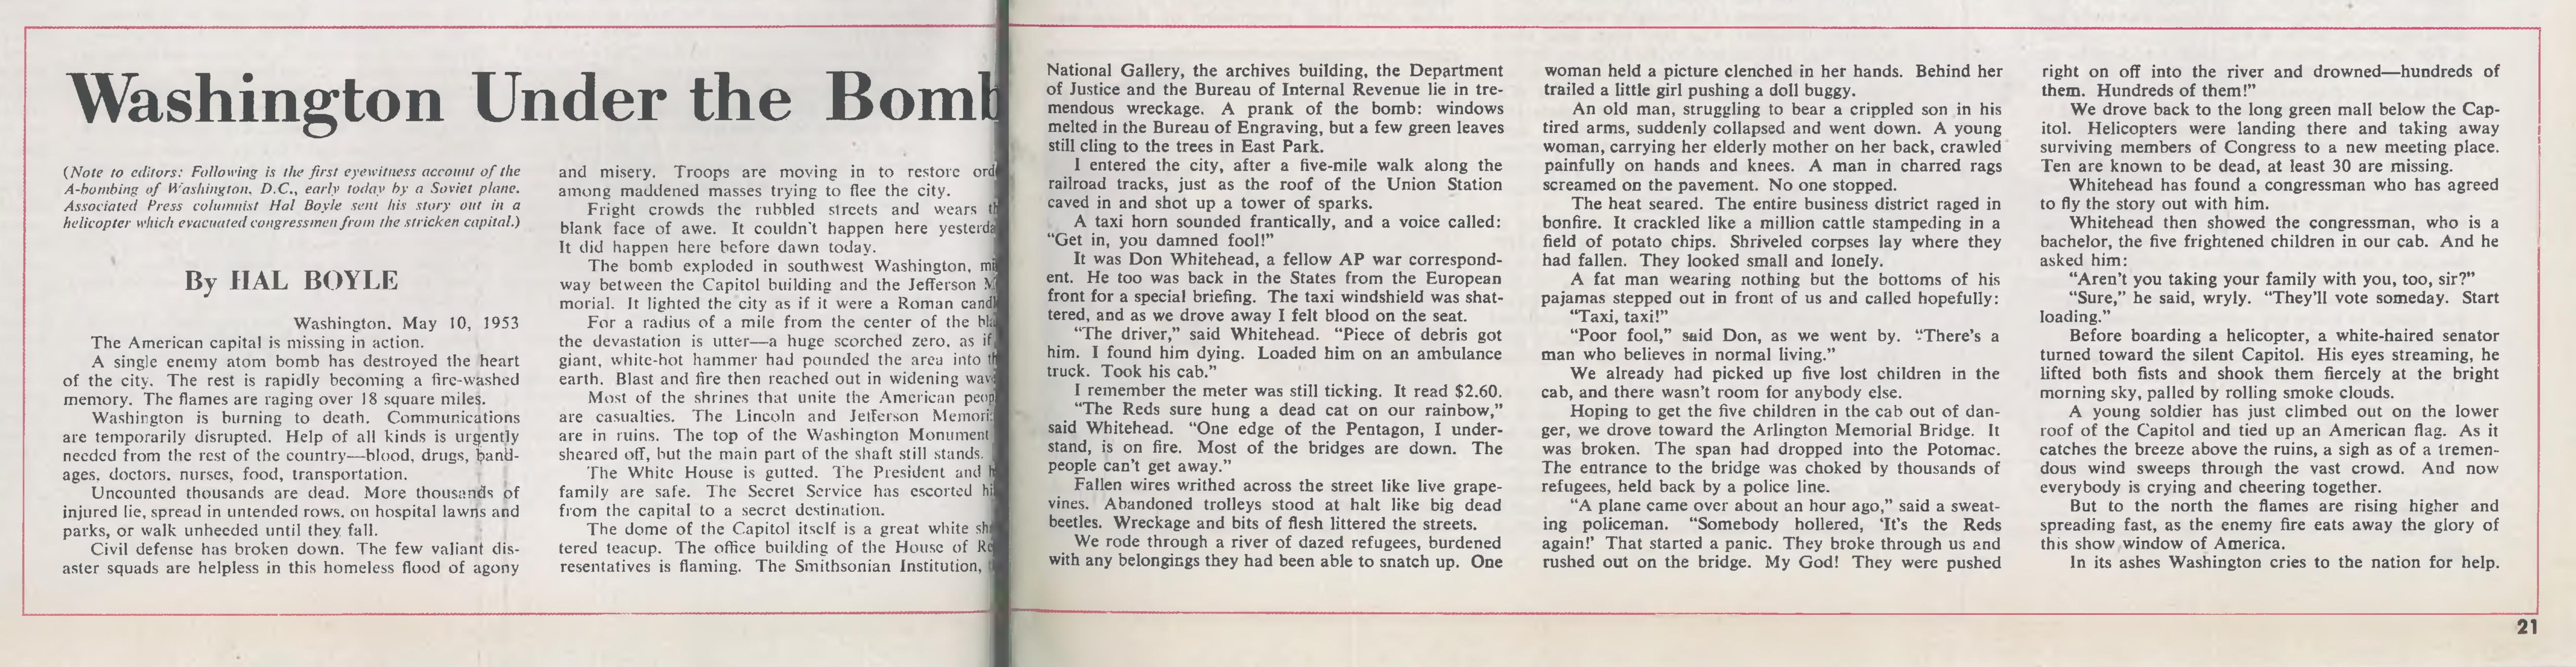 Collier's Weekly, 27 October 1951-20-21.jpg